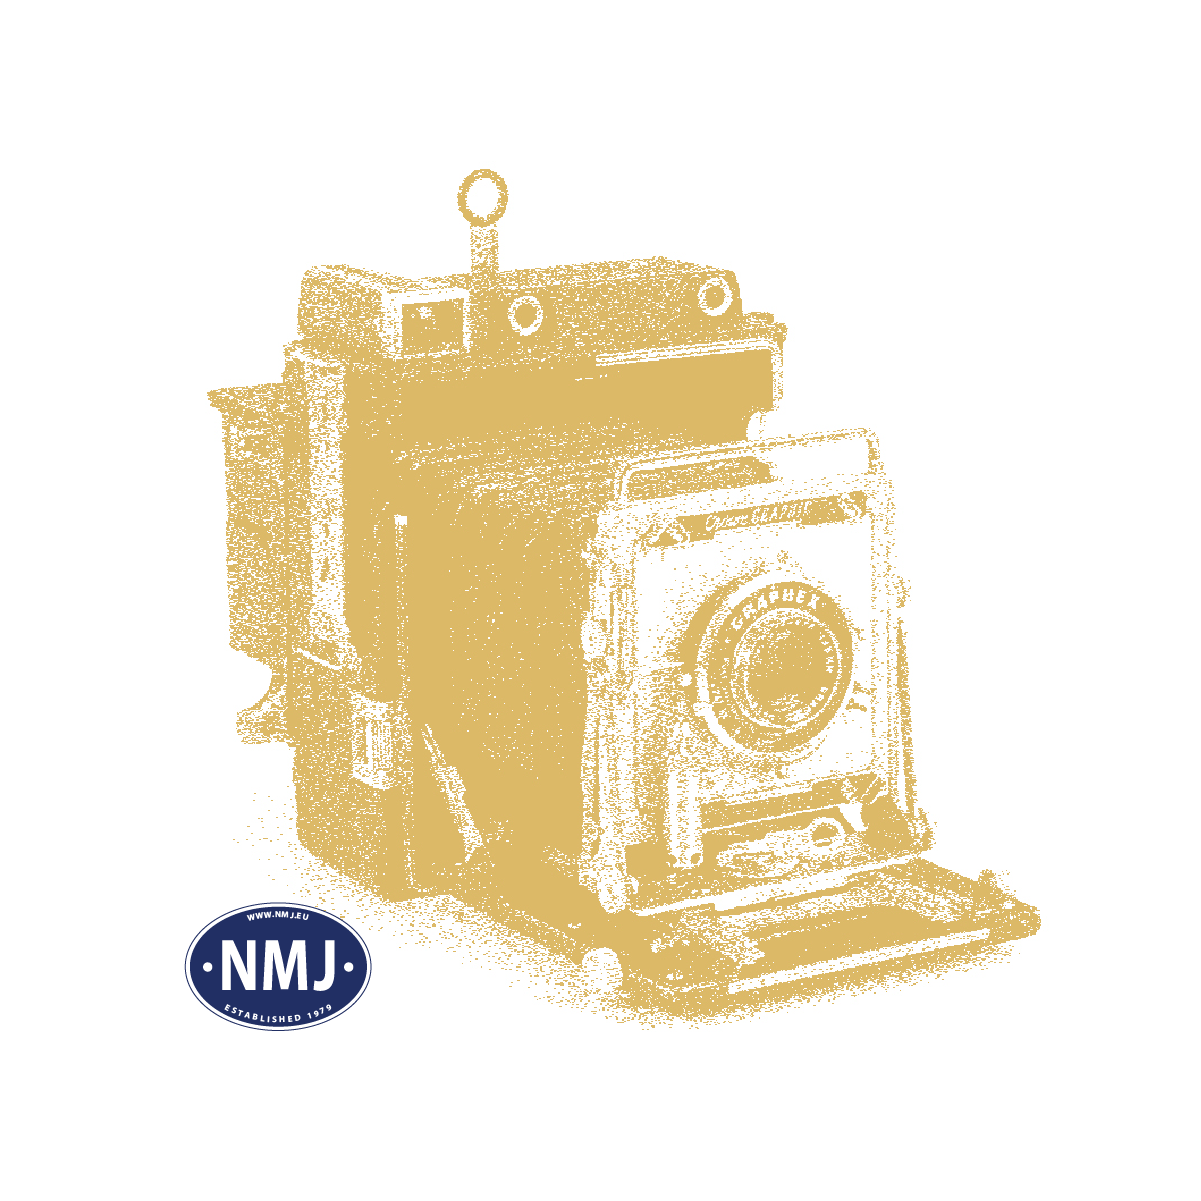 NMJT202.501 - NMJ Topline SJ S11 4871 Kino og Bistrovogn, Rød/Blå/Sort